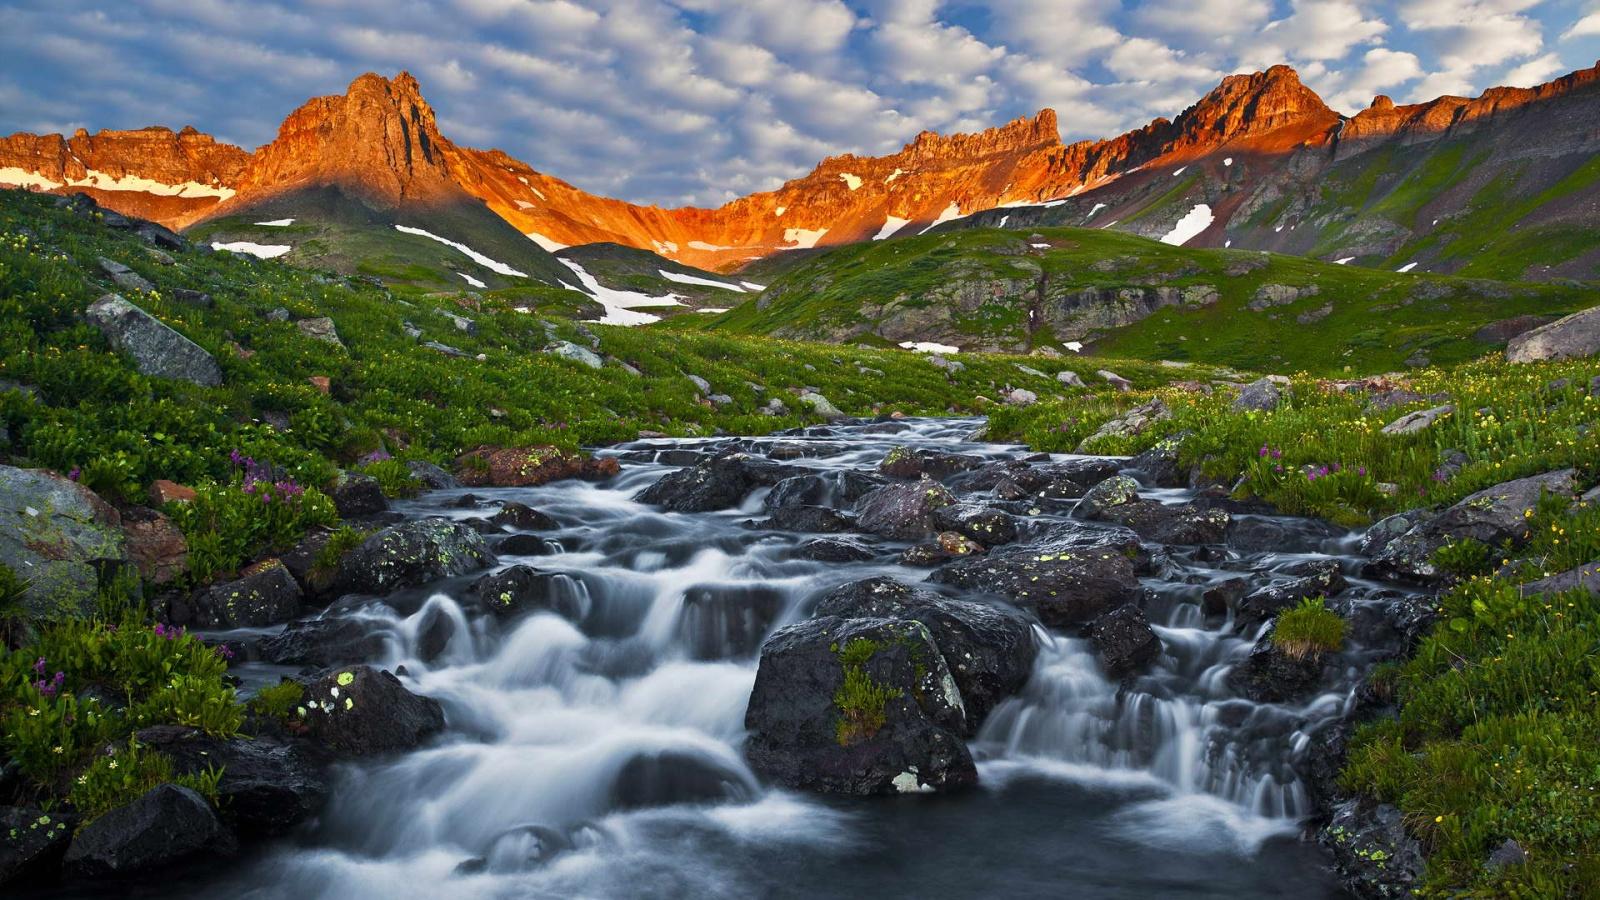 Ice Lake Basin Wallpapers - 1600x900 - 671327 Desktop Wallpaper